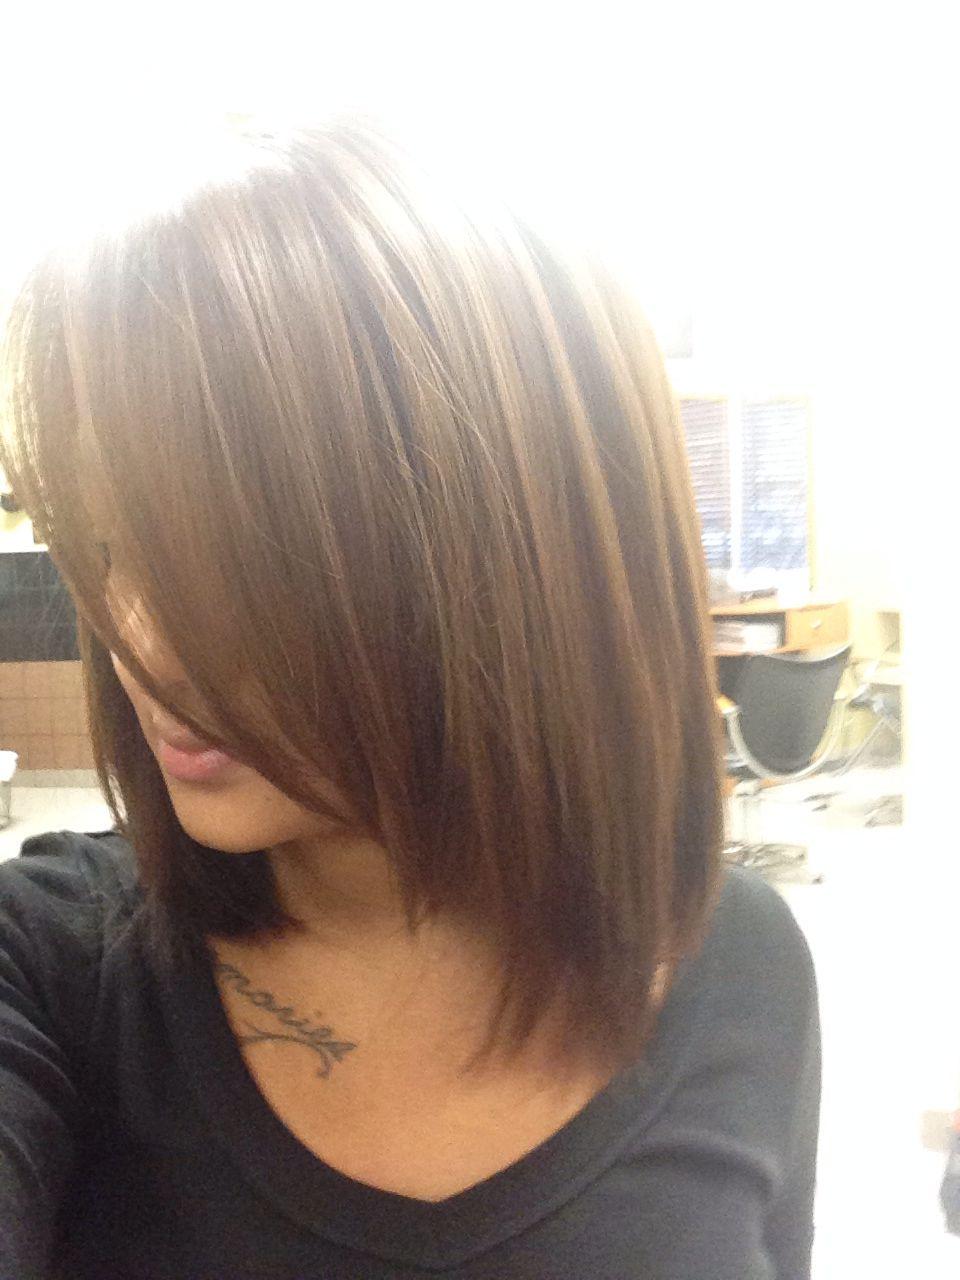 Medium brown hair w highlights it def love the length long